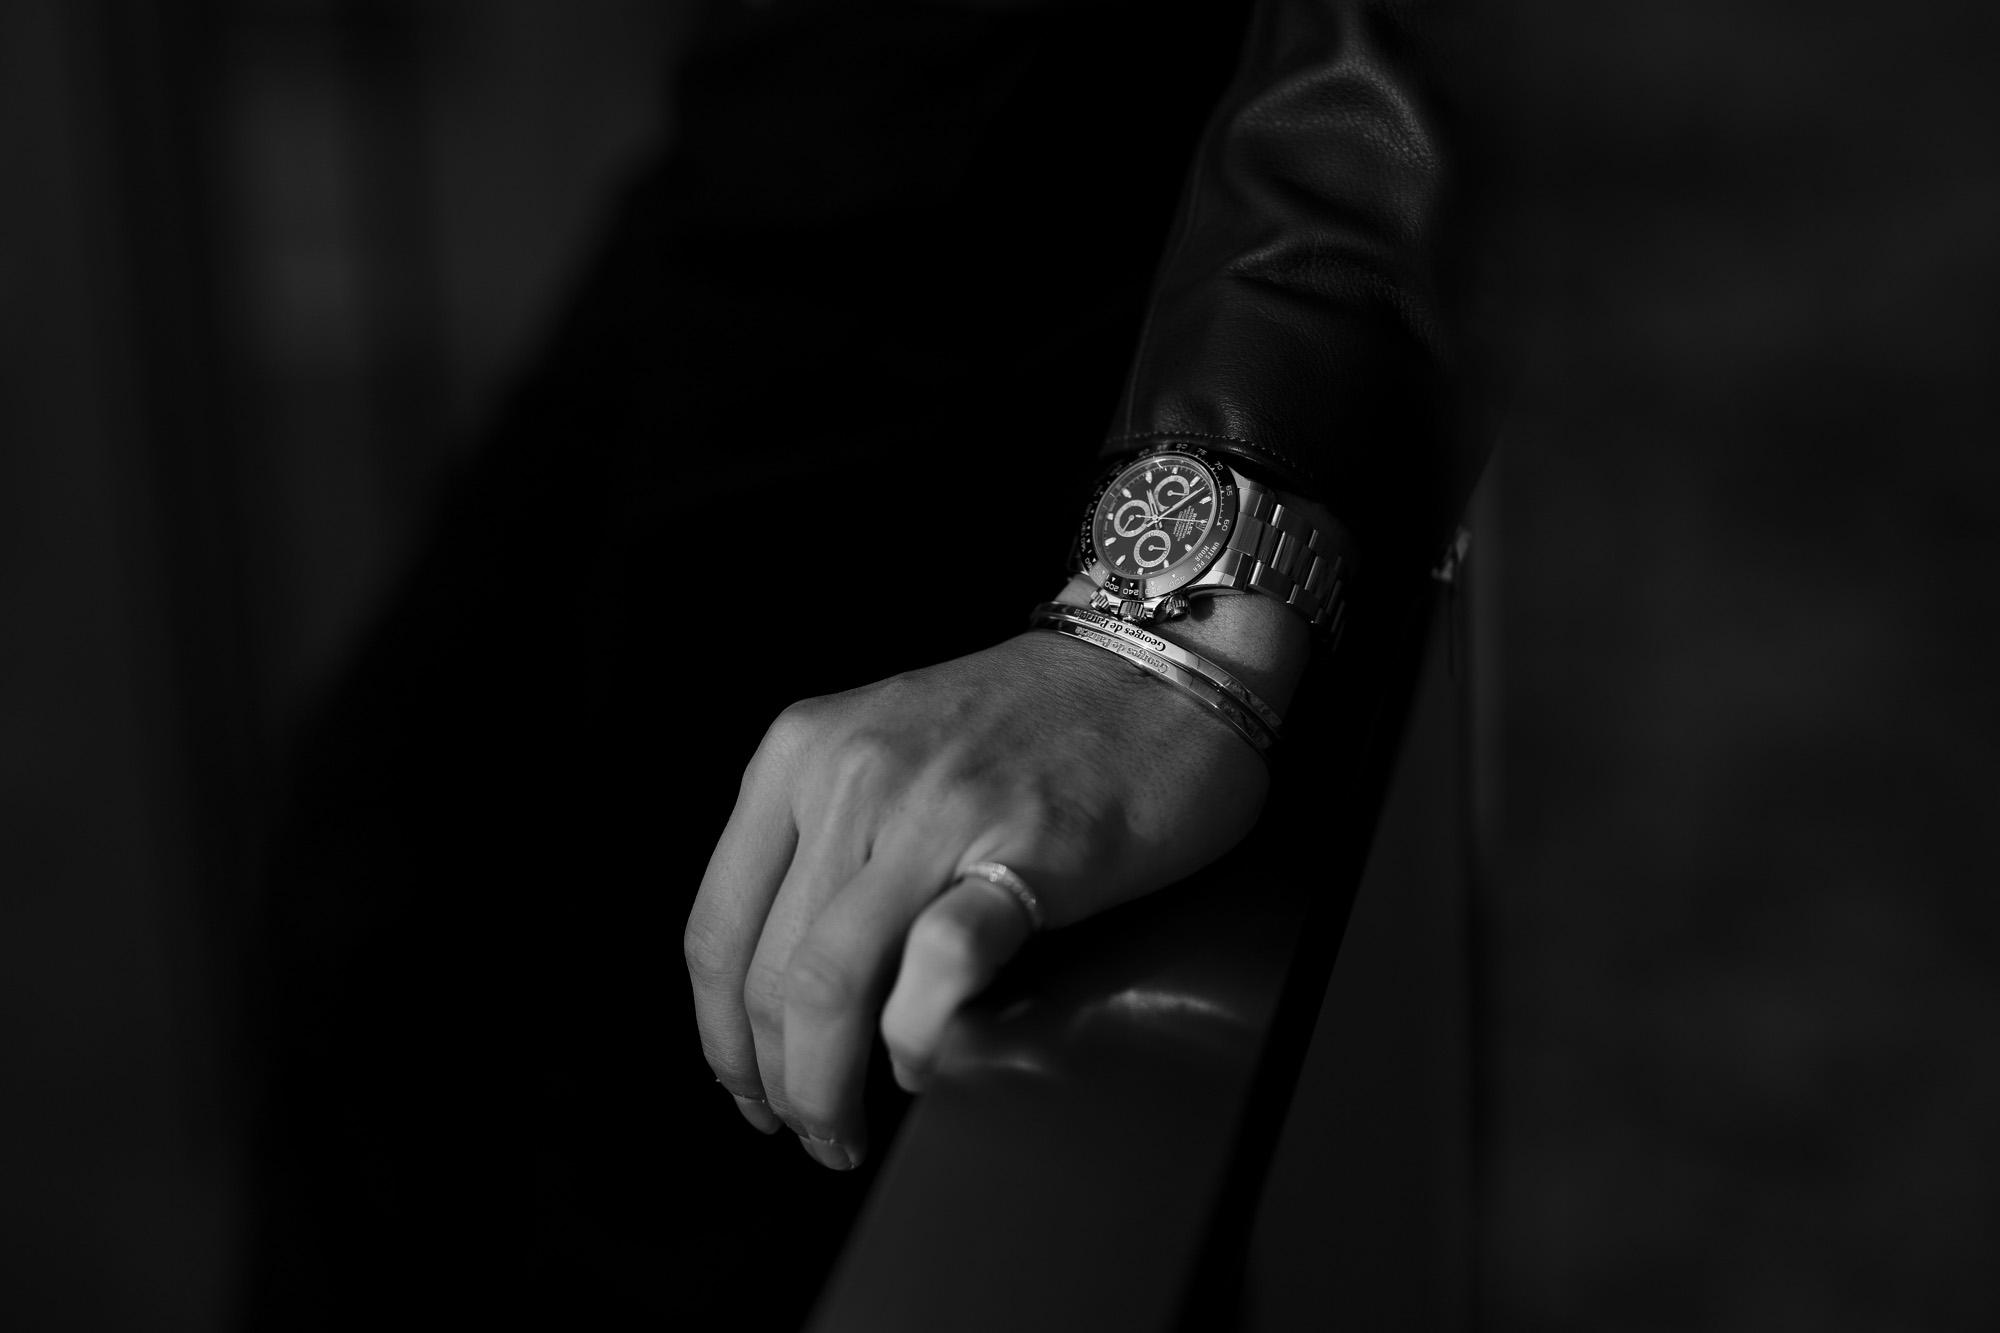 "Georges de Patricia ""Wraith 18K GOLD"" × Georges de Patricia ""Ghost 18K GOLD,925 STERLING SILVER"" × ROLEX ""COSMOGRAPH DAYTONA 116500LN"" ジョルジュドパトリシア レイス 18Kゴールド ゴースト ロレックス デイトナ 愛知 名古屋 Alto e Diritto altoediritto アルトエデリット コーディネート スペシャルモデル"